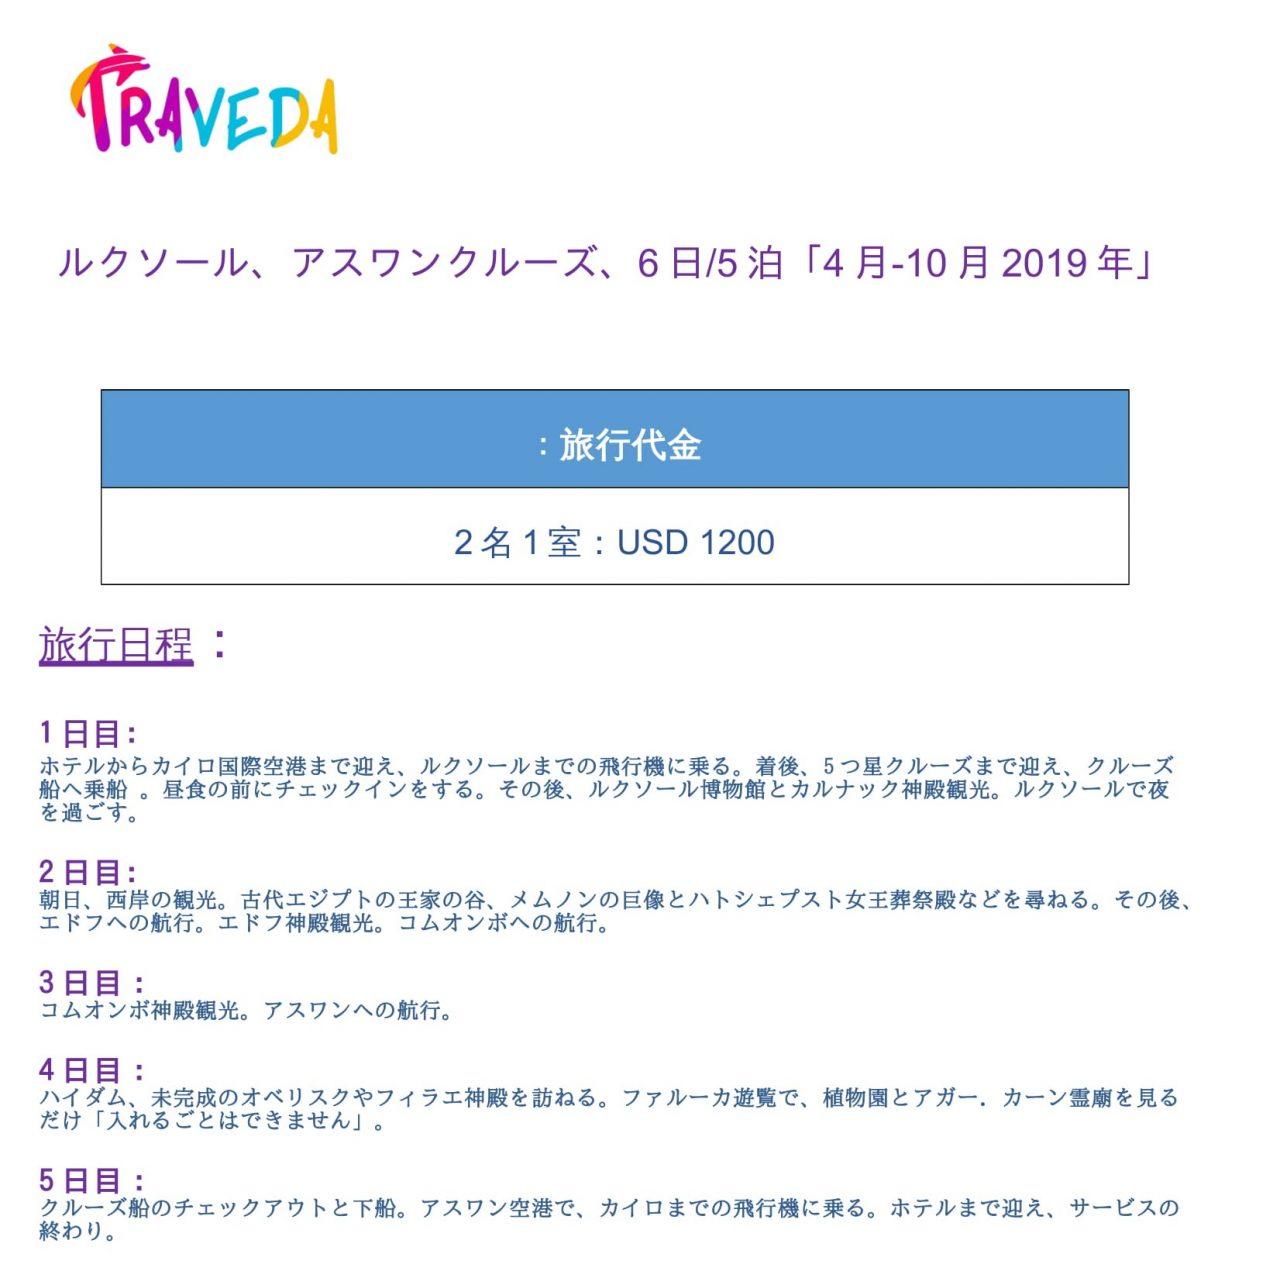 https://traveda.net/wp-content/uploads/2019/03/LUXOR-ASWAN-CRUISE-05DAYS-04NIGHTS-Japanese-1-1280x1285.jpg